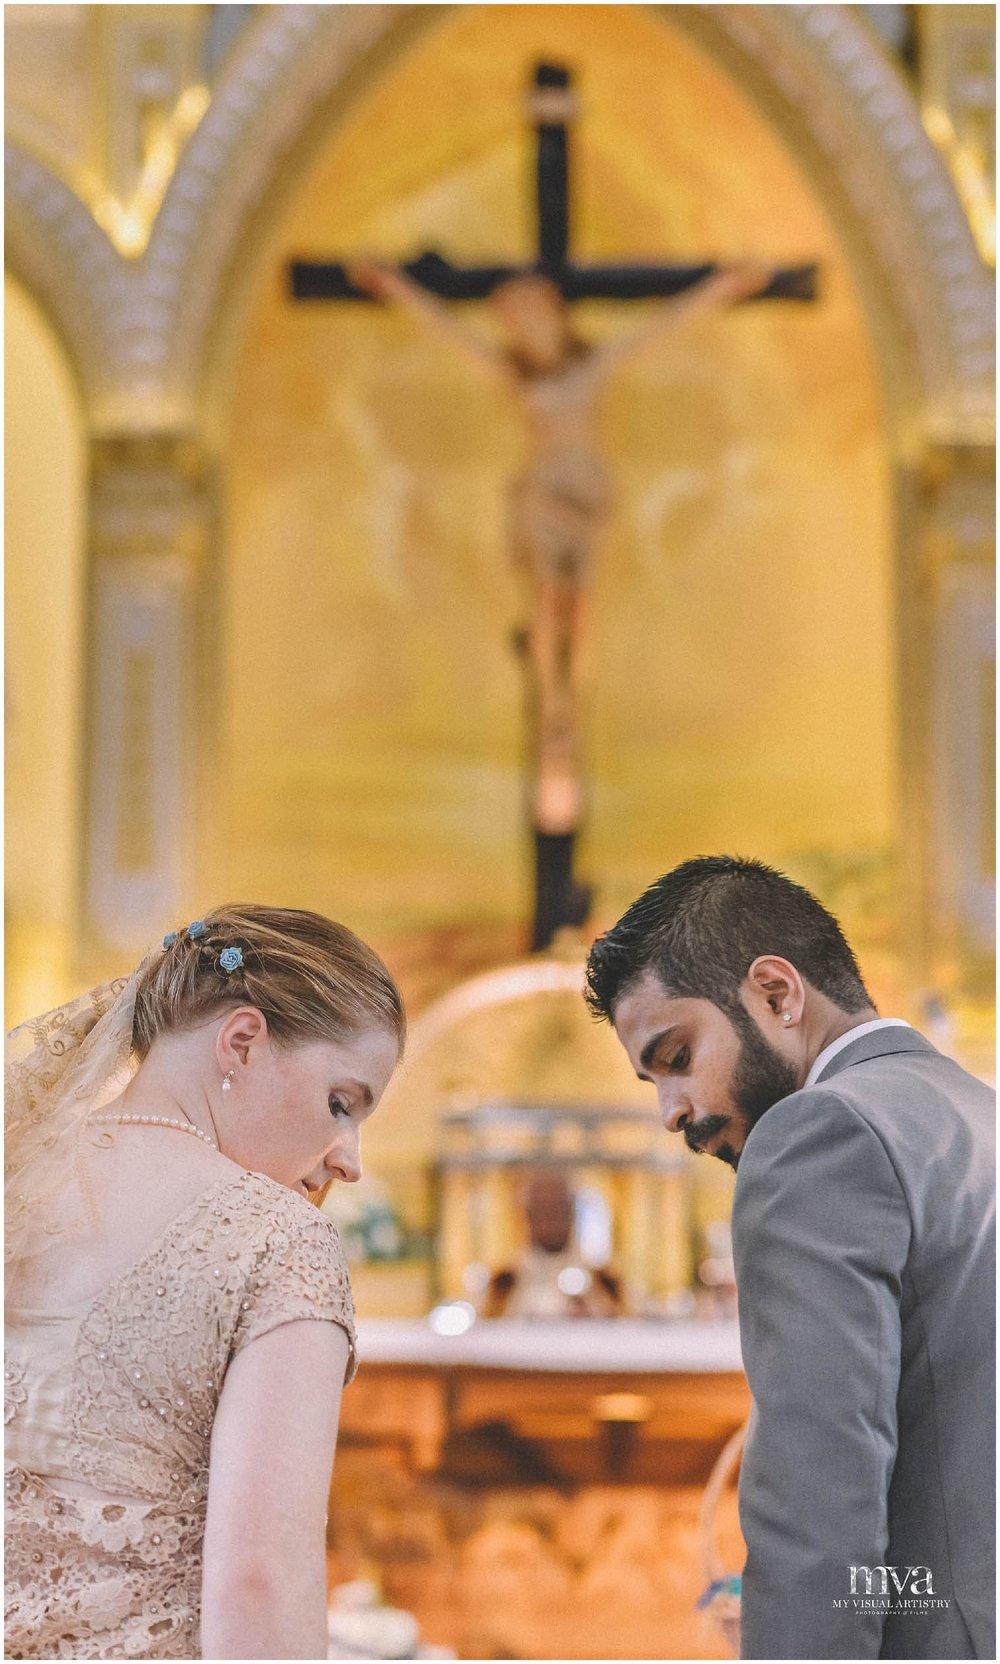 JOSEPH_LIDIA_MYVISUALARTISTRY_POLAND_WEDDING_PHOTOGRAPHER_MVA_JAIPUR_KERALA_MUNNAR_COCHIN_0023.jpg